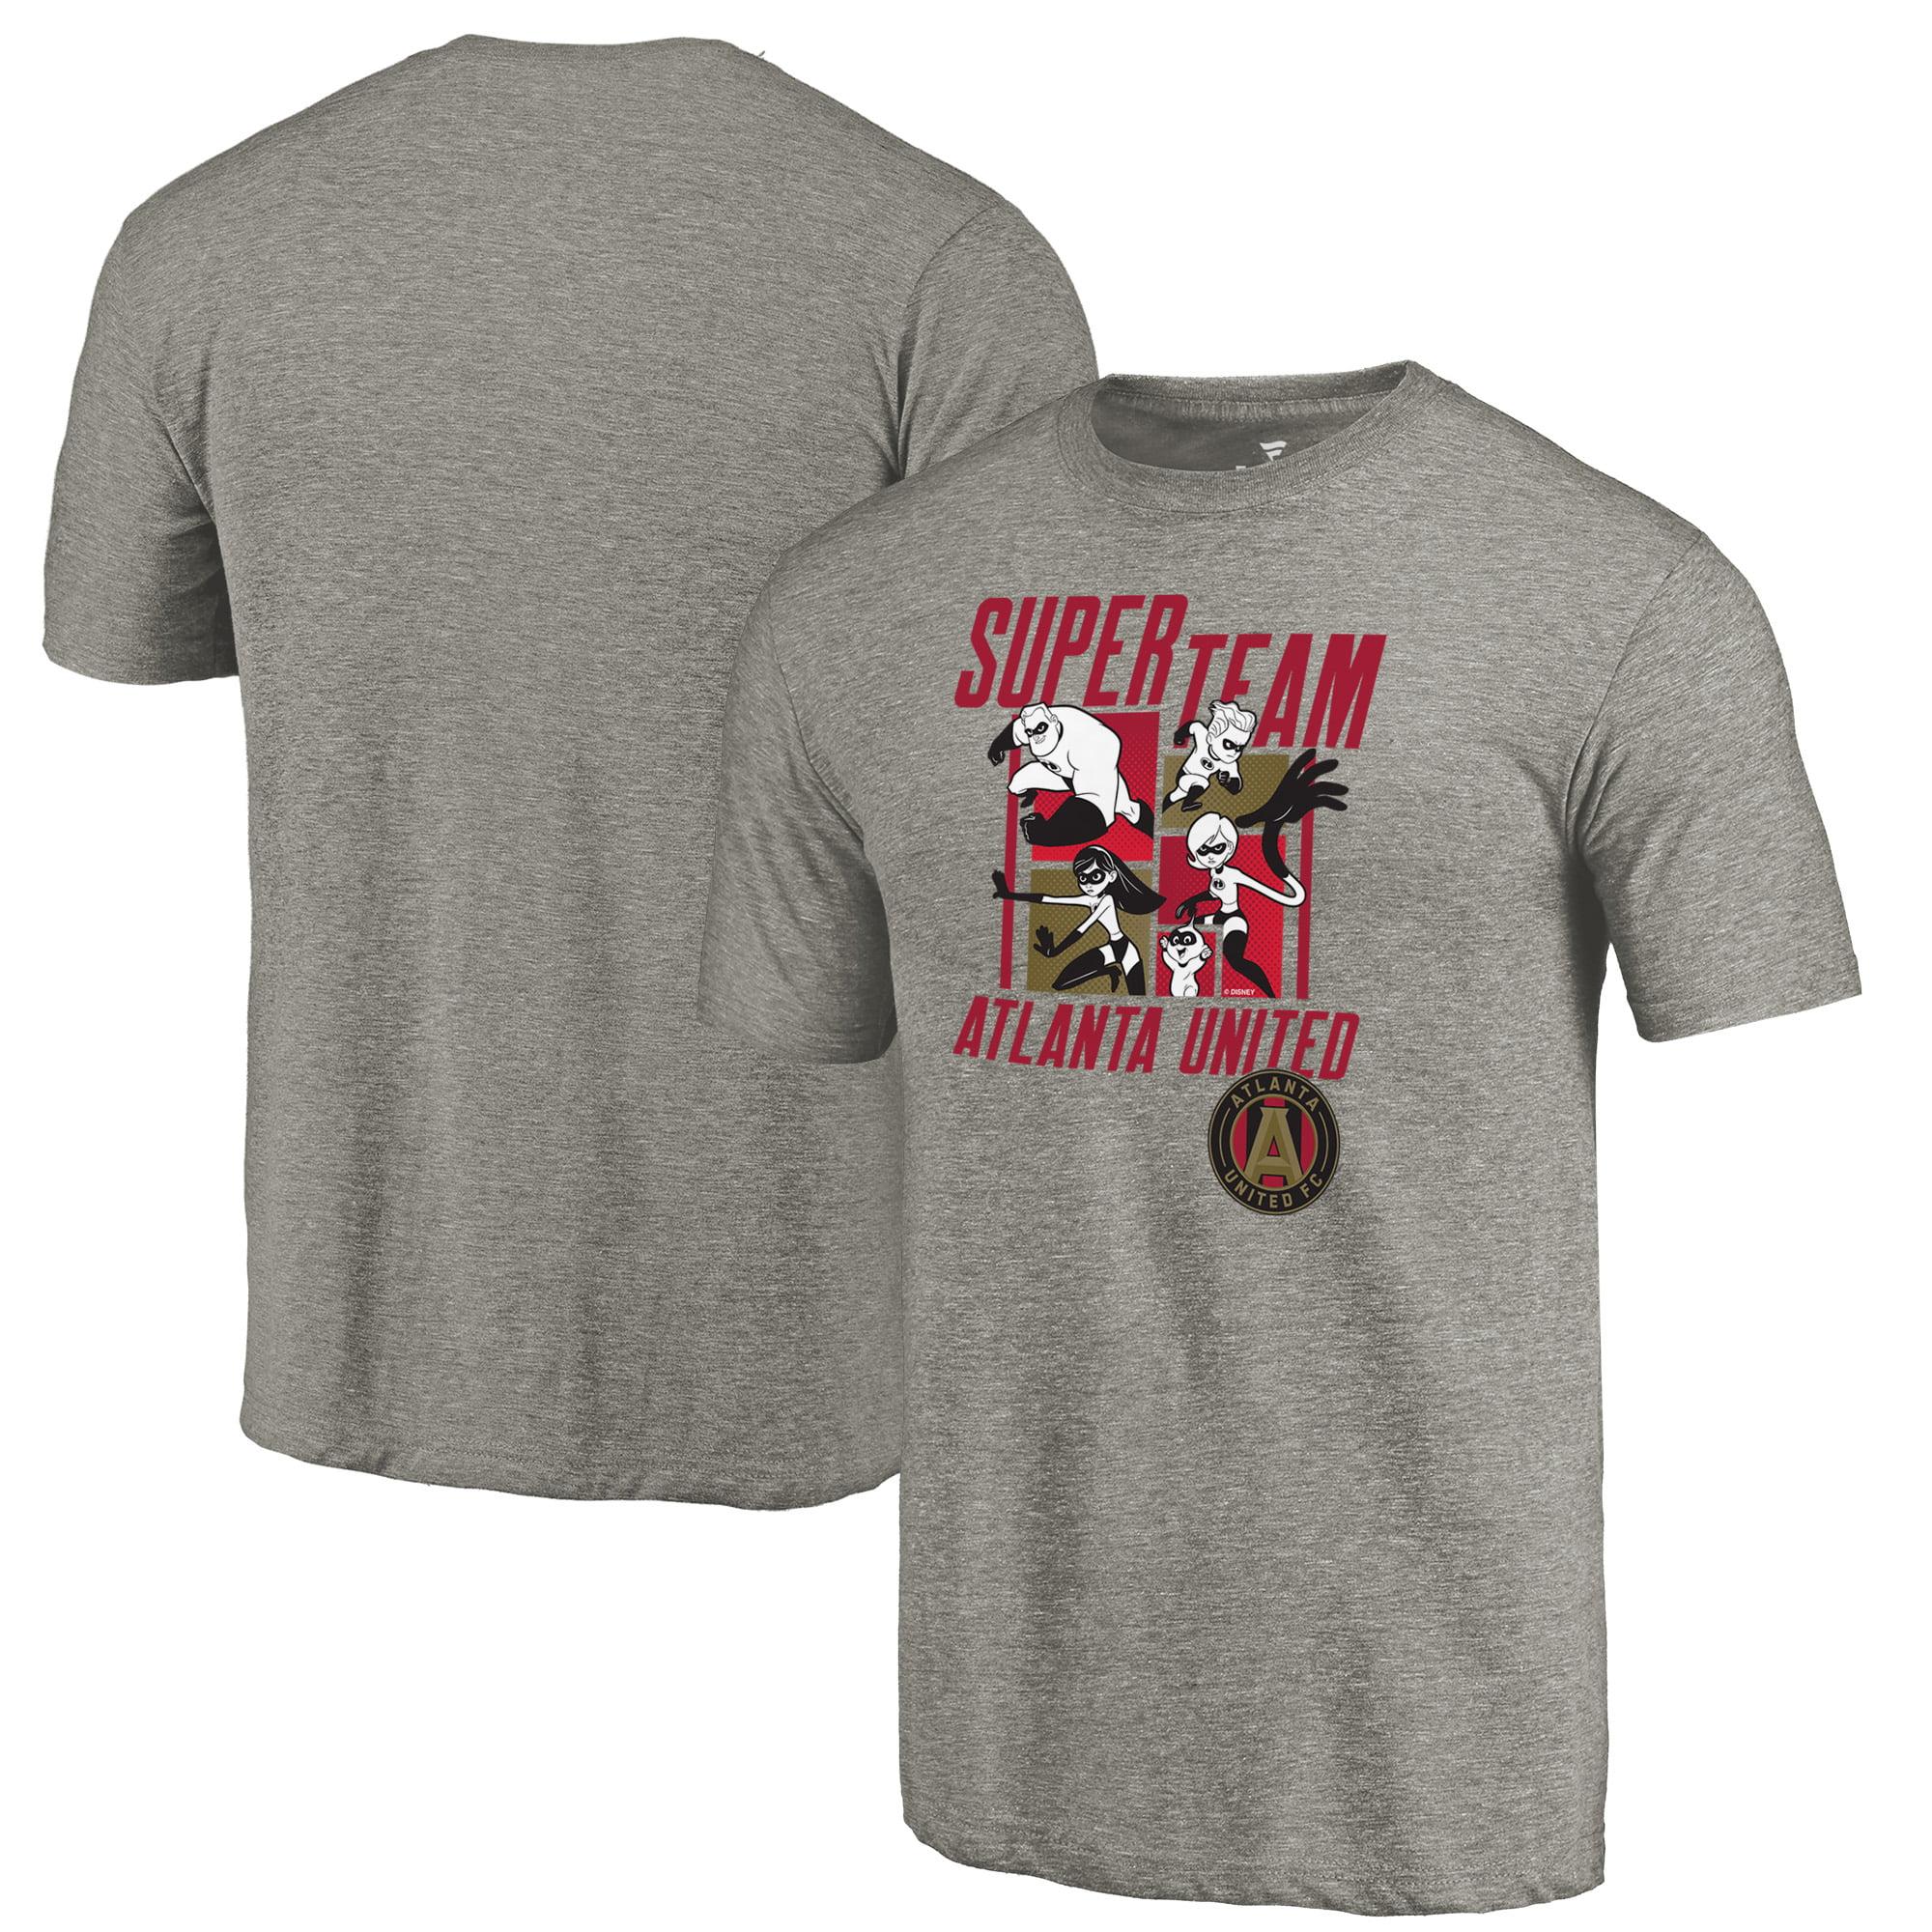 Atlanta United FC Fanatics Branded Disney Pixar The Incredibles Super Team Tri-Blend T-Shirt - Heathered Gray